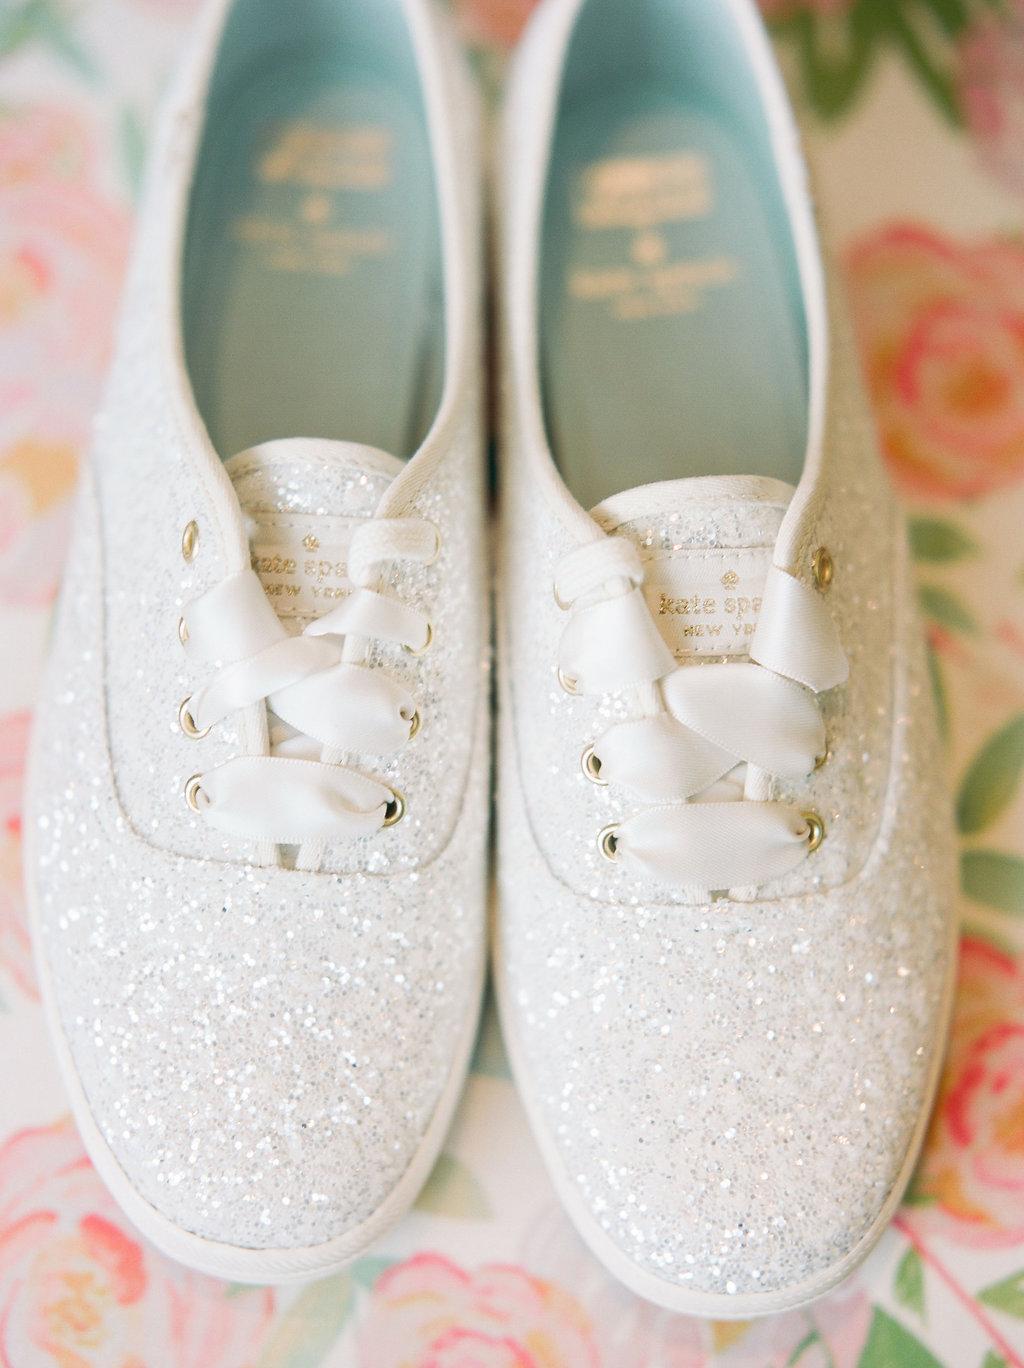 Kate Spade wedding shoes - https://ruffledblog.com/modern-playful-texas-carnival-wedding